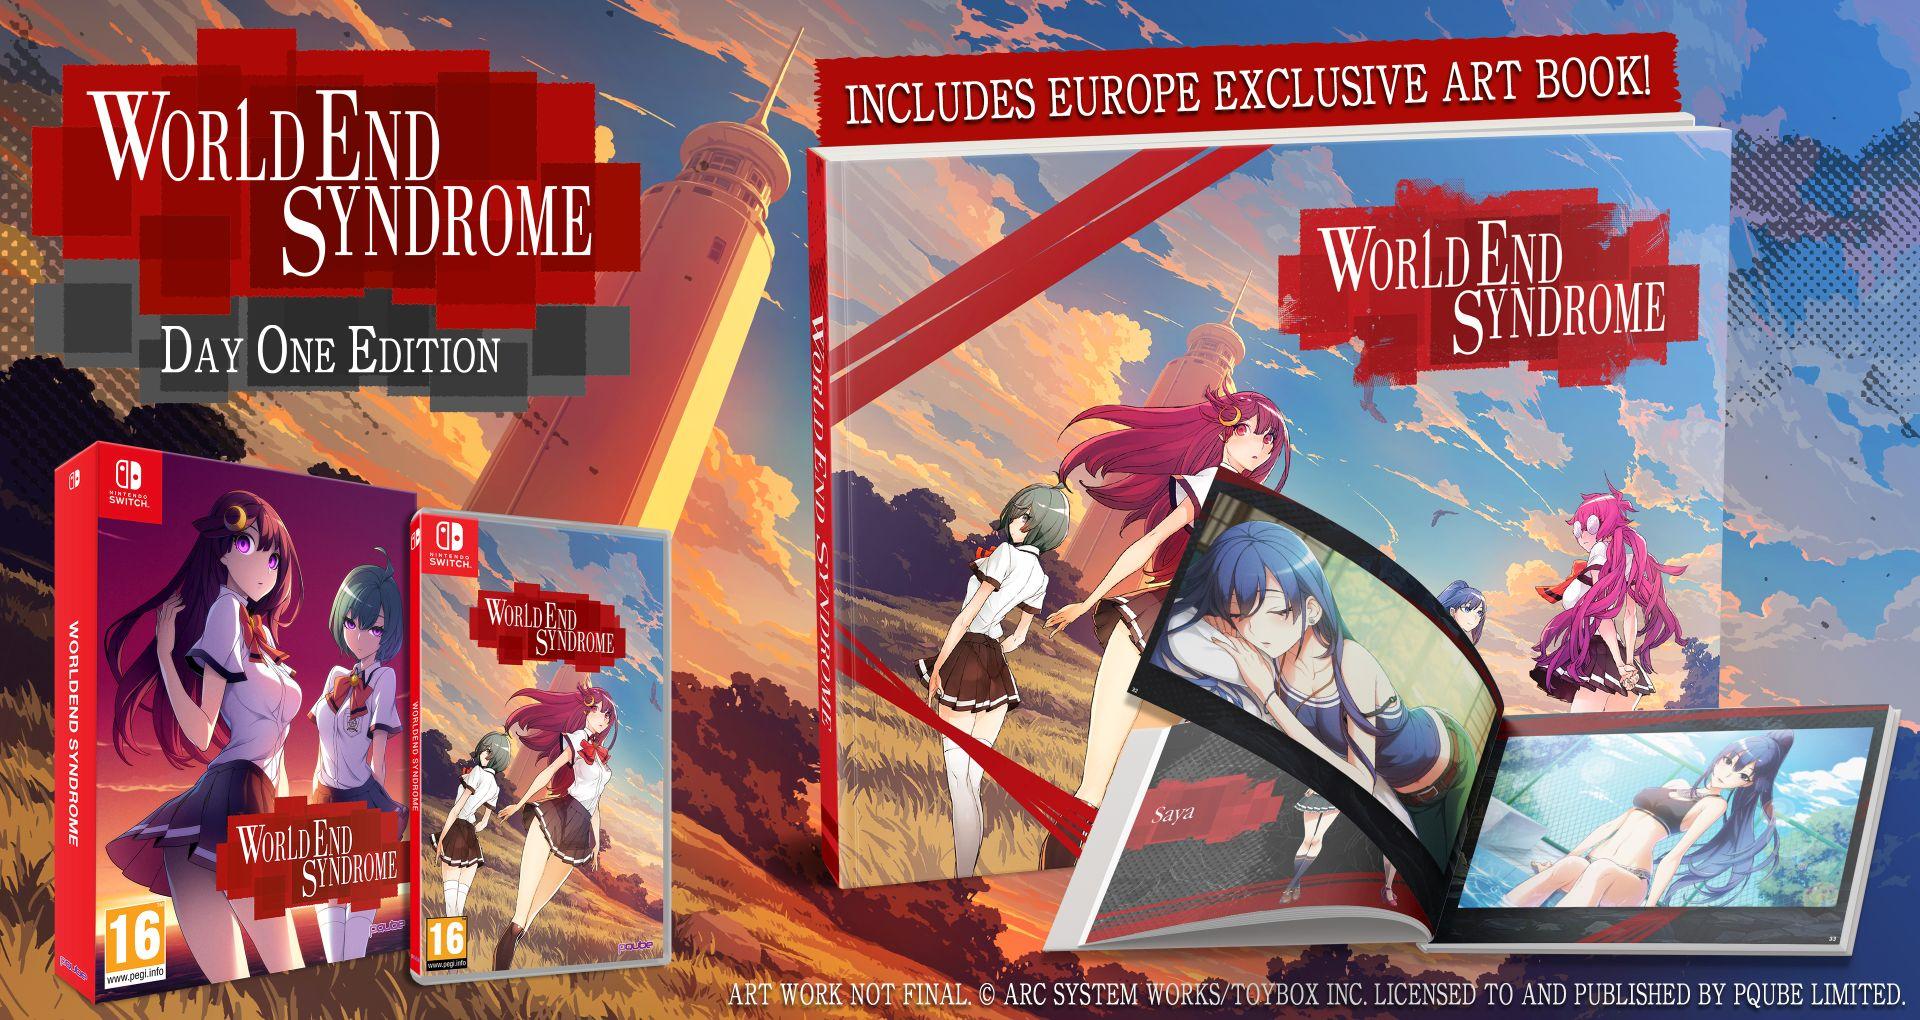 [Switch] Visual Novel WorldEnd Syndrome chega em junho na Europa